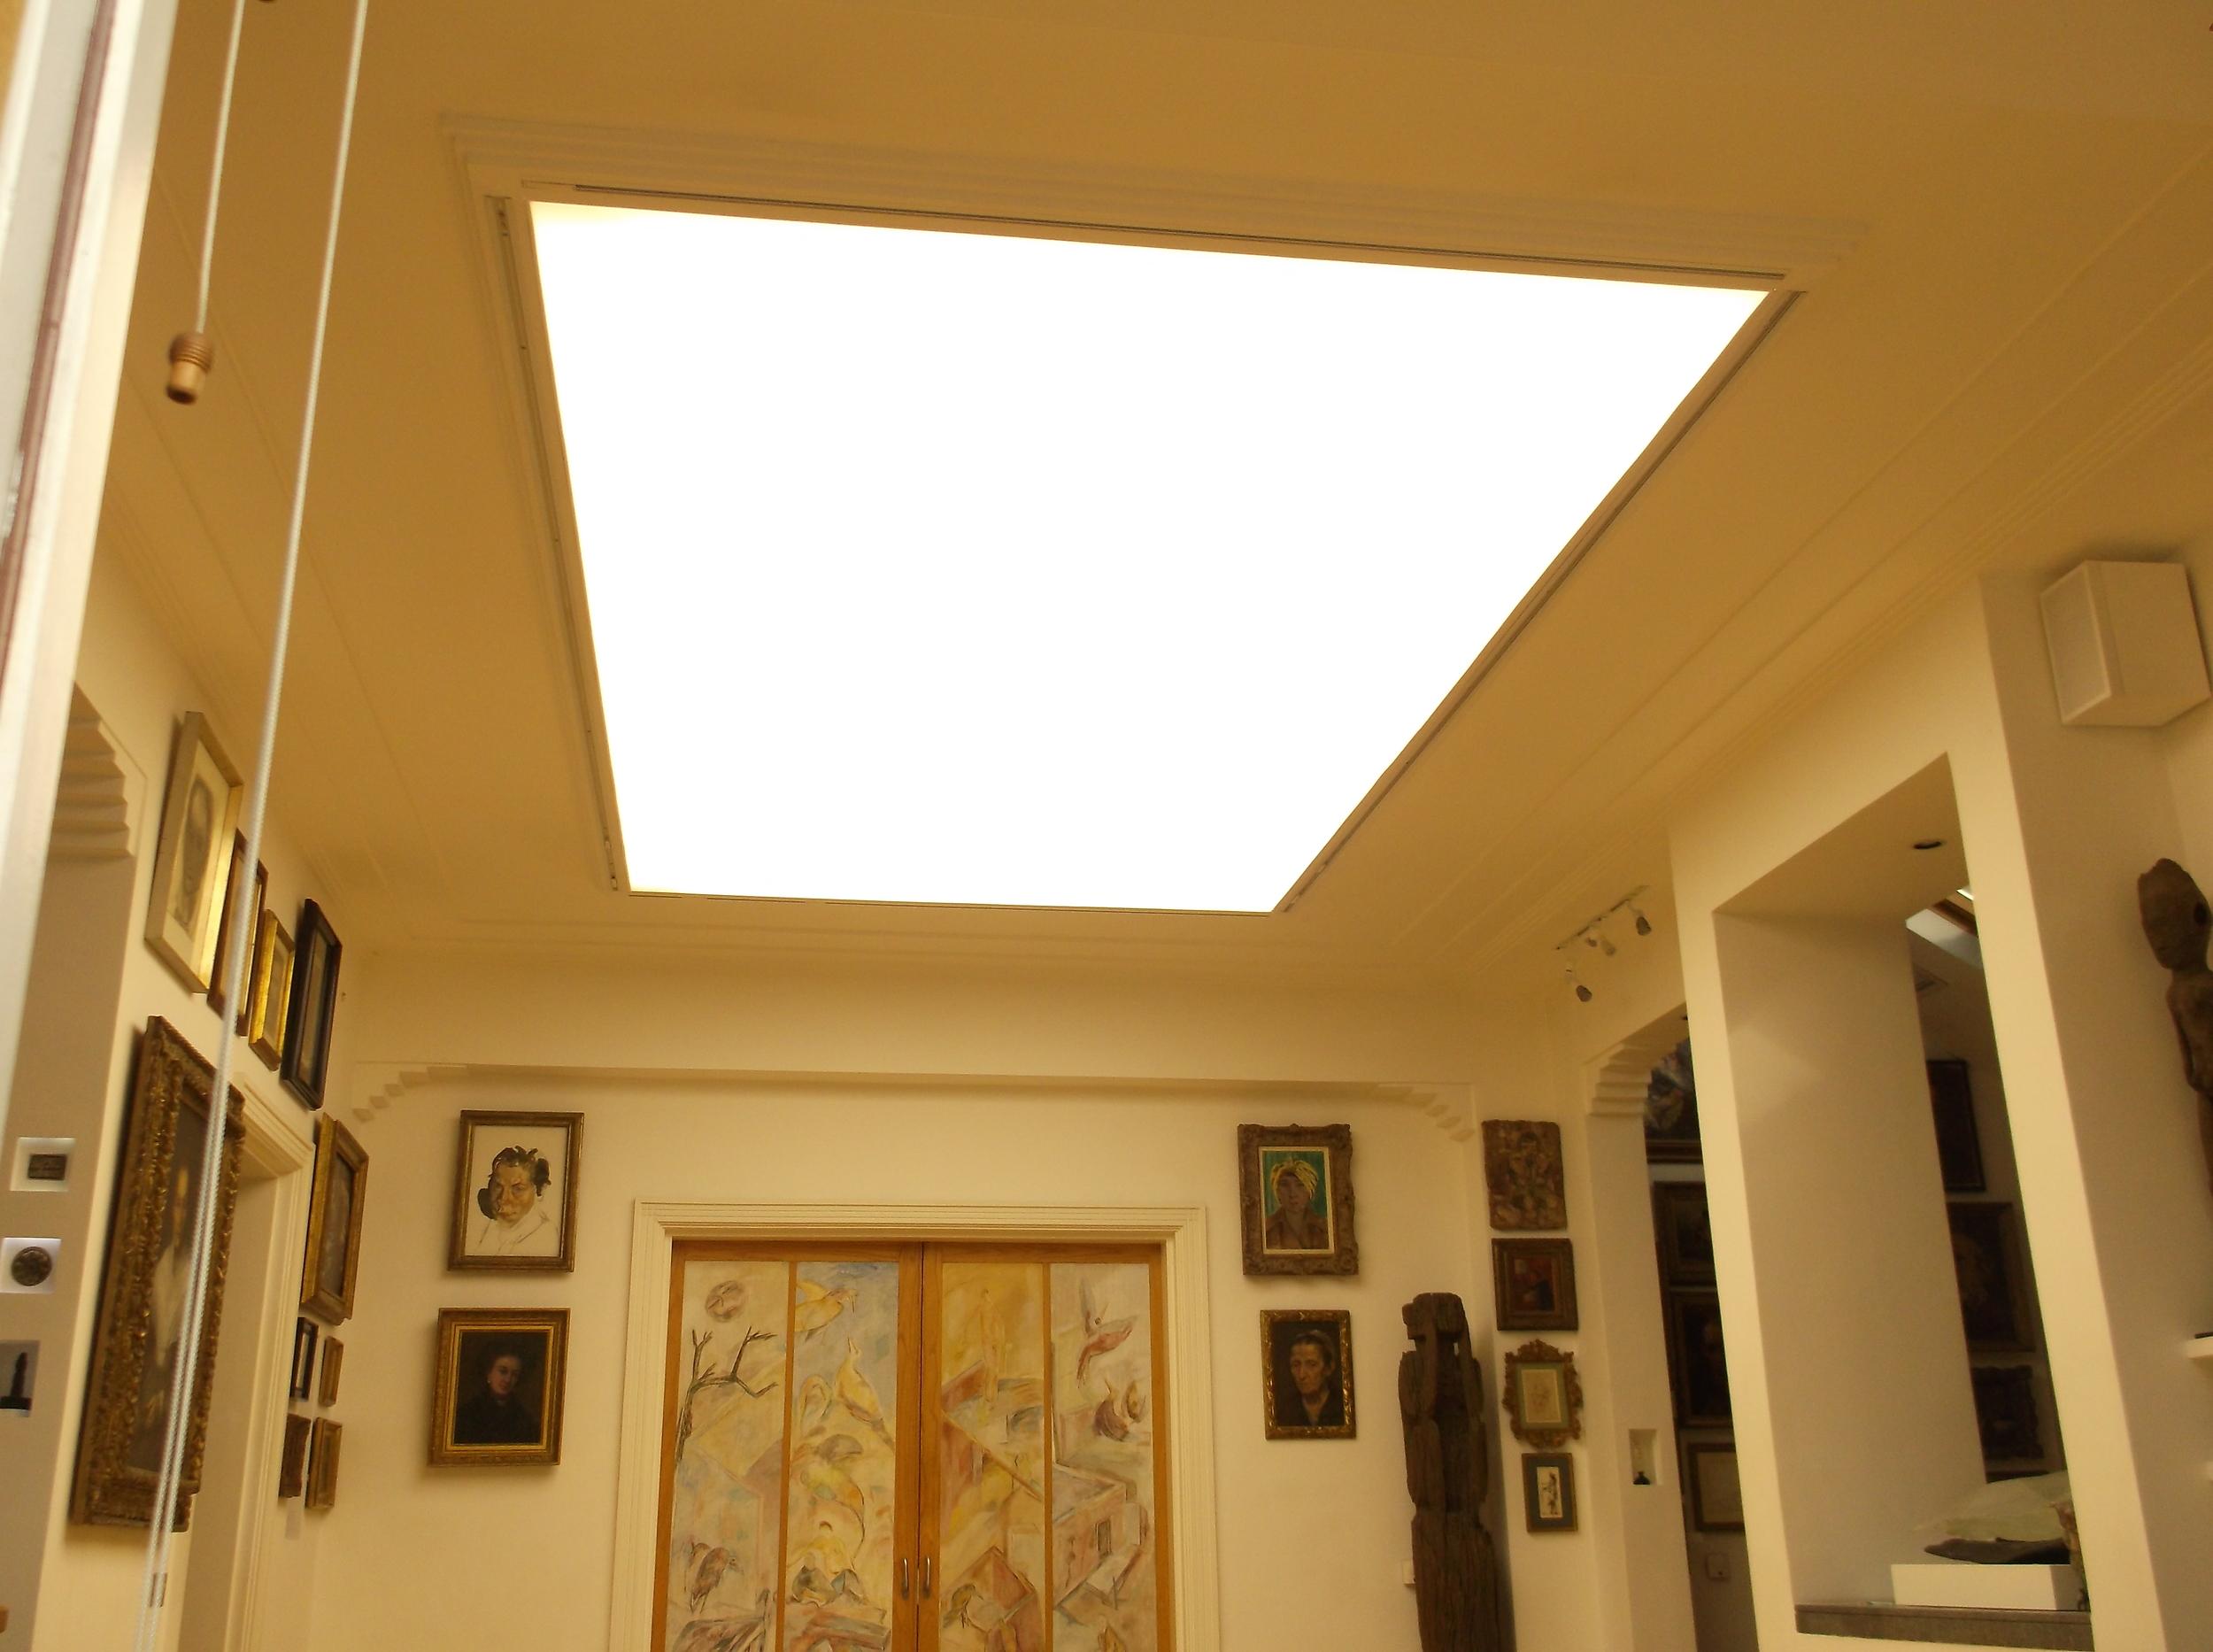 Lighting Diffuser Stretch Ceiling Light Box